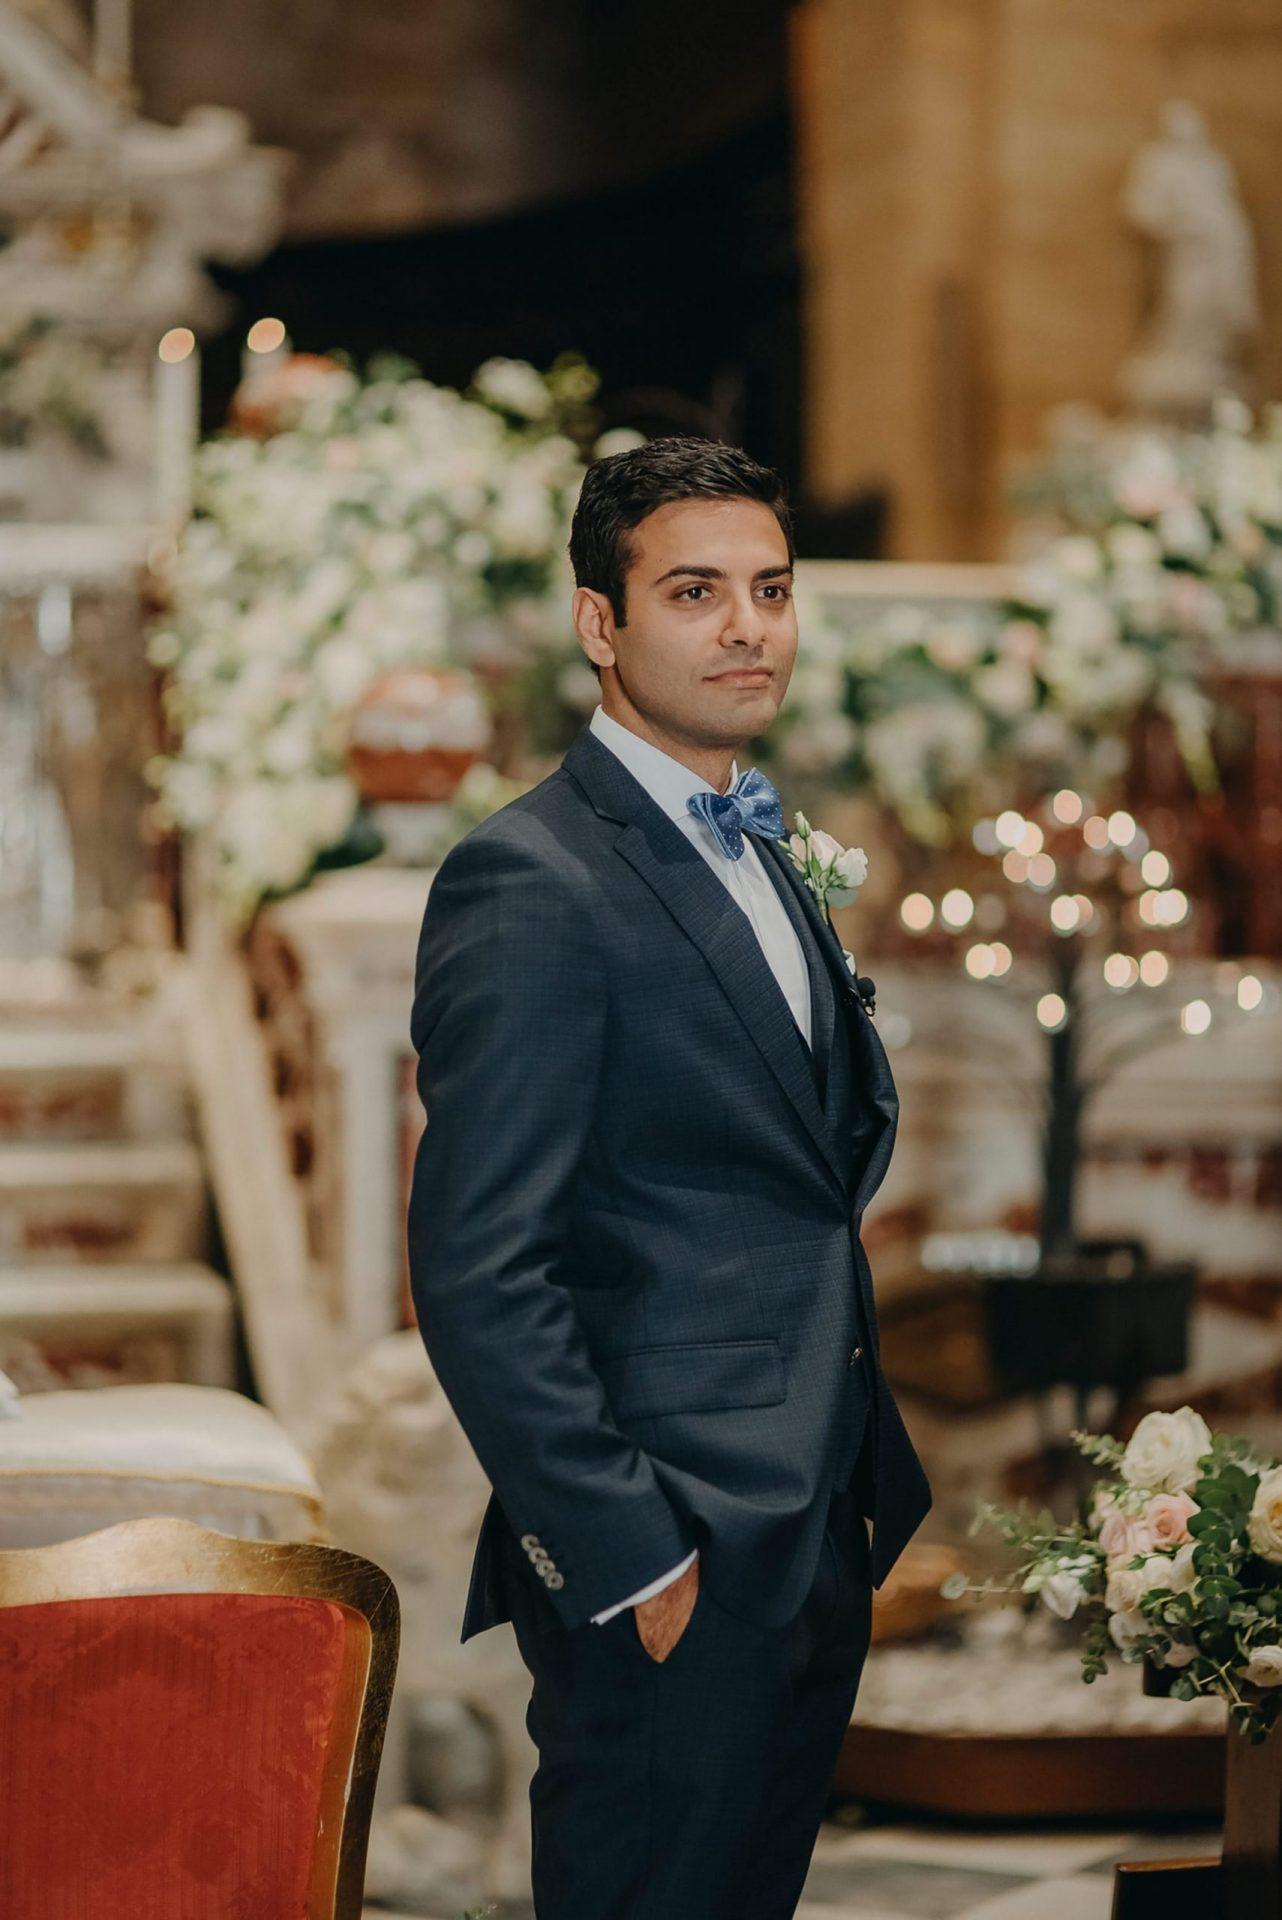 Simona and Elie, the groom